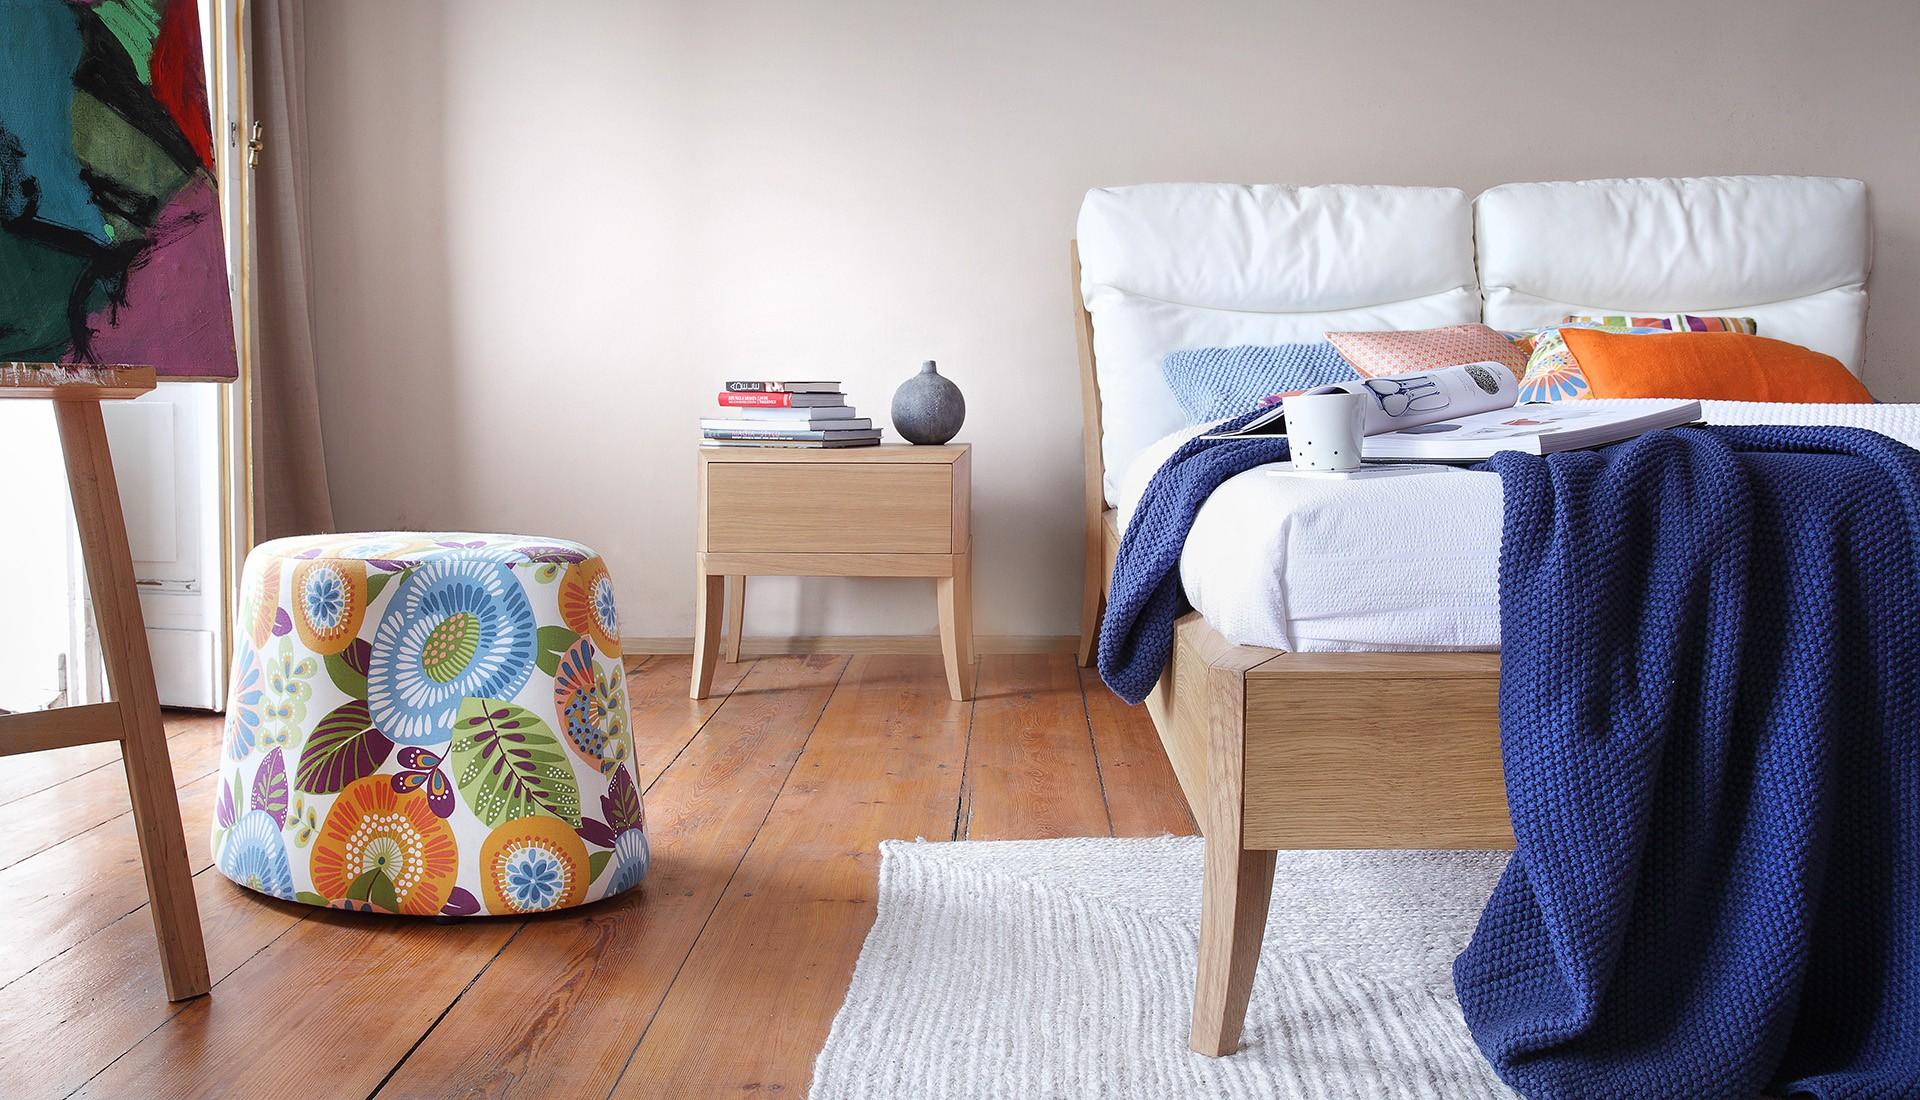 test1 Спальня Dream (Swarzedz Home, Польша) Фото 10